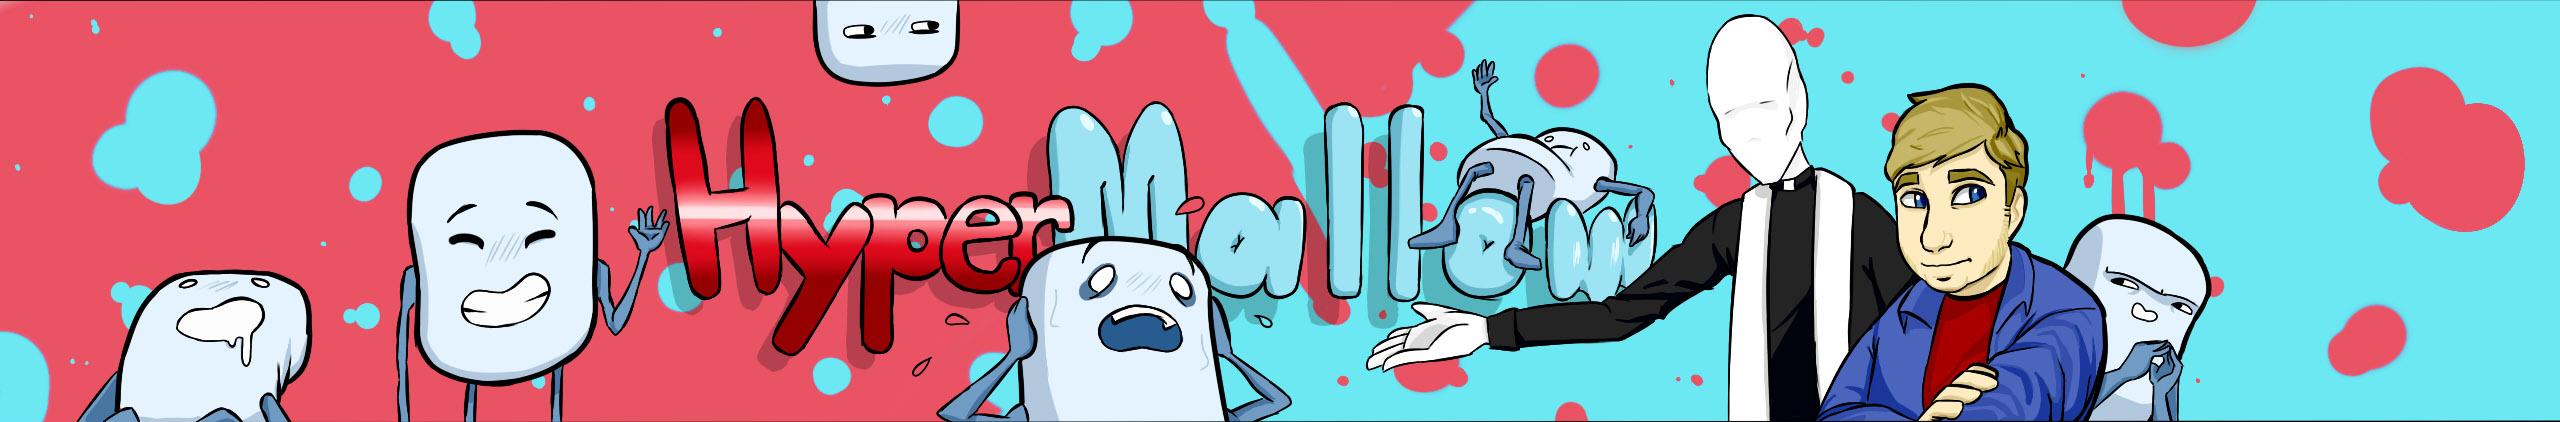 HyperMallow channel banner